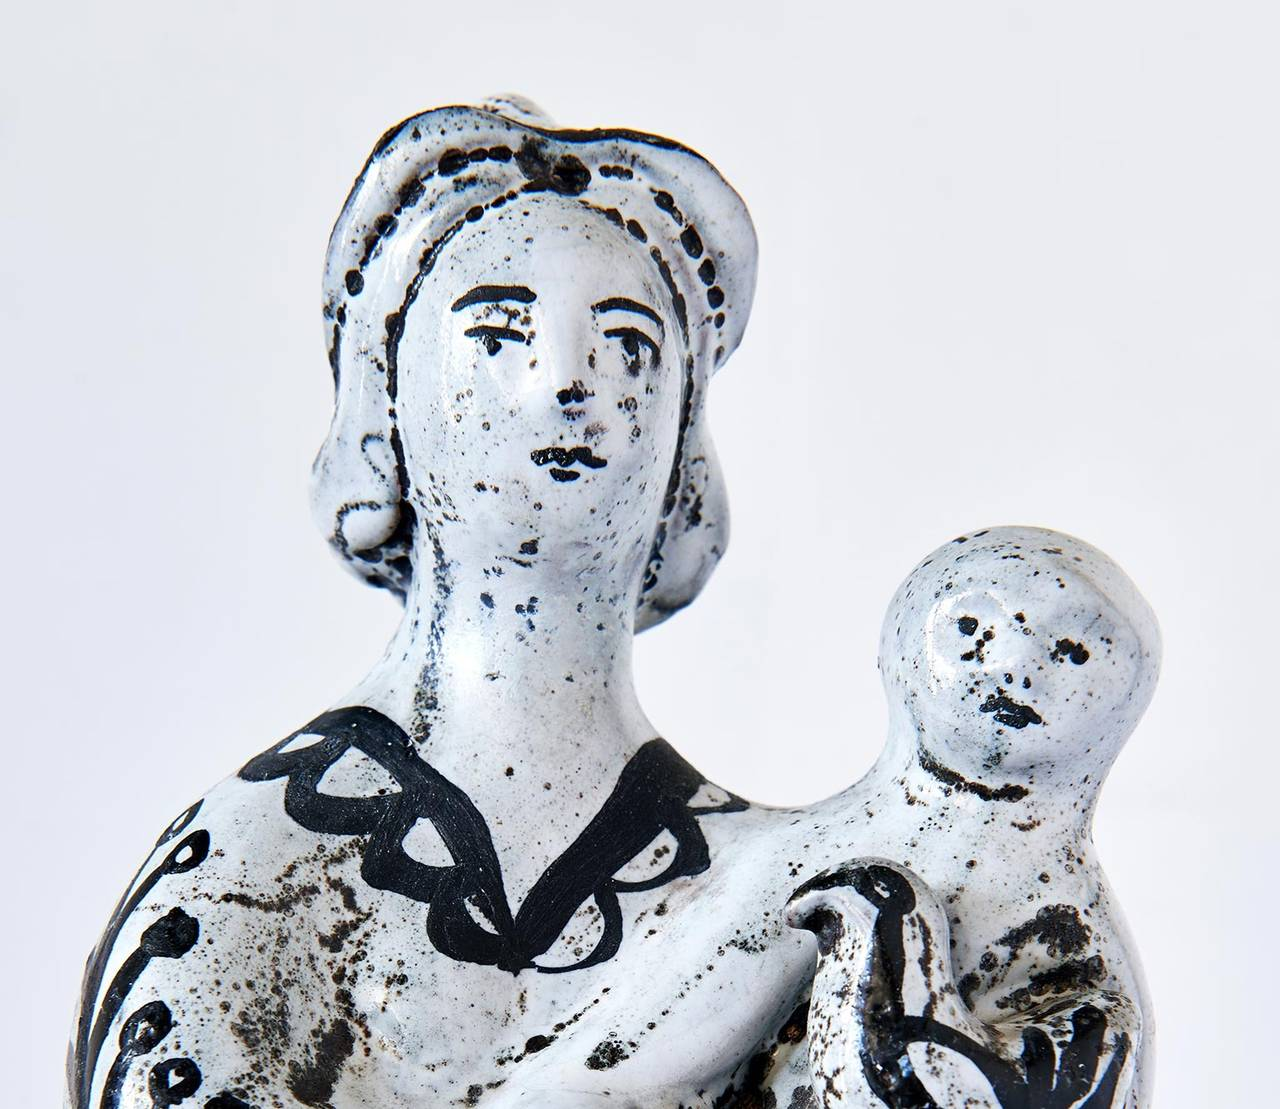 Glazed Ceramic Sculpture by Roger Capron For Sale